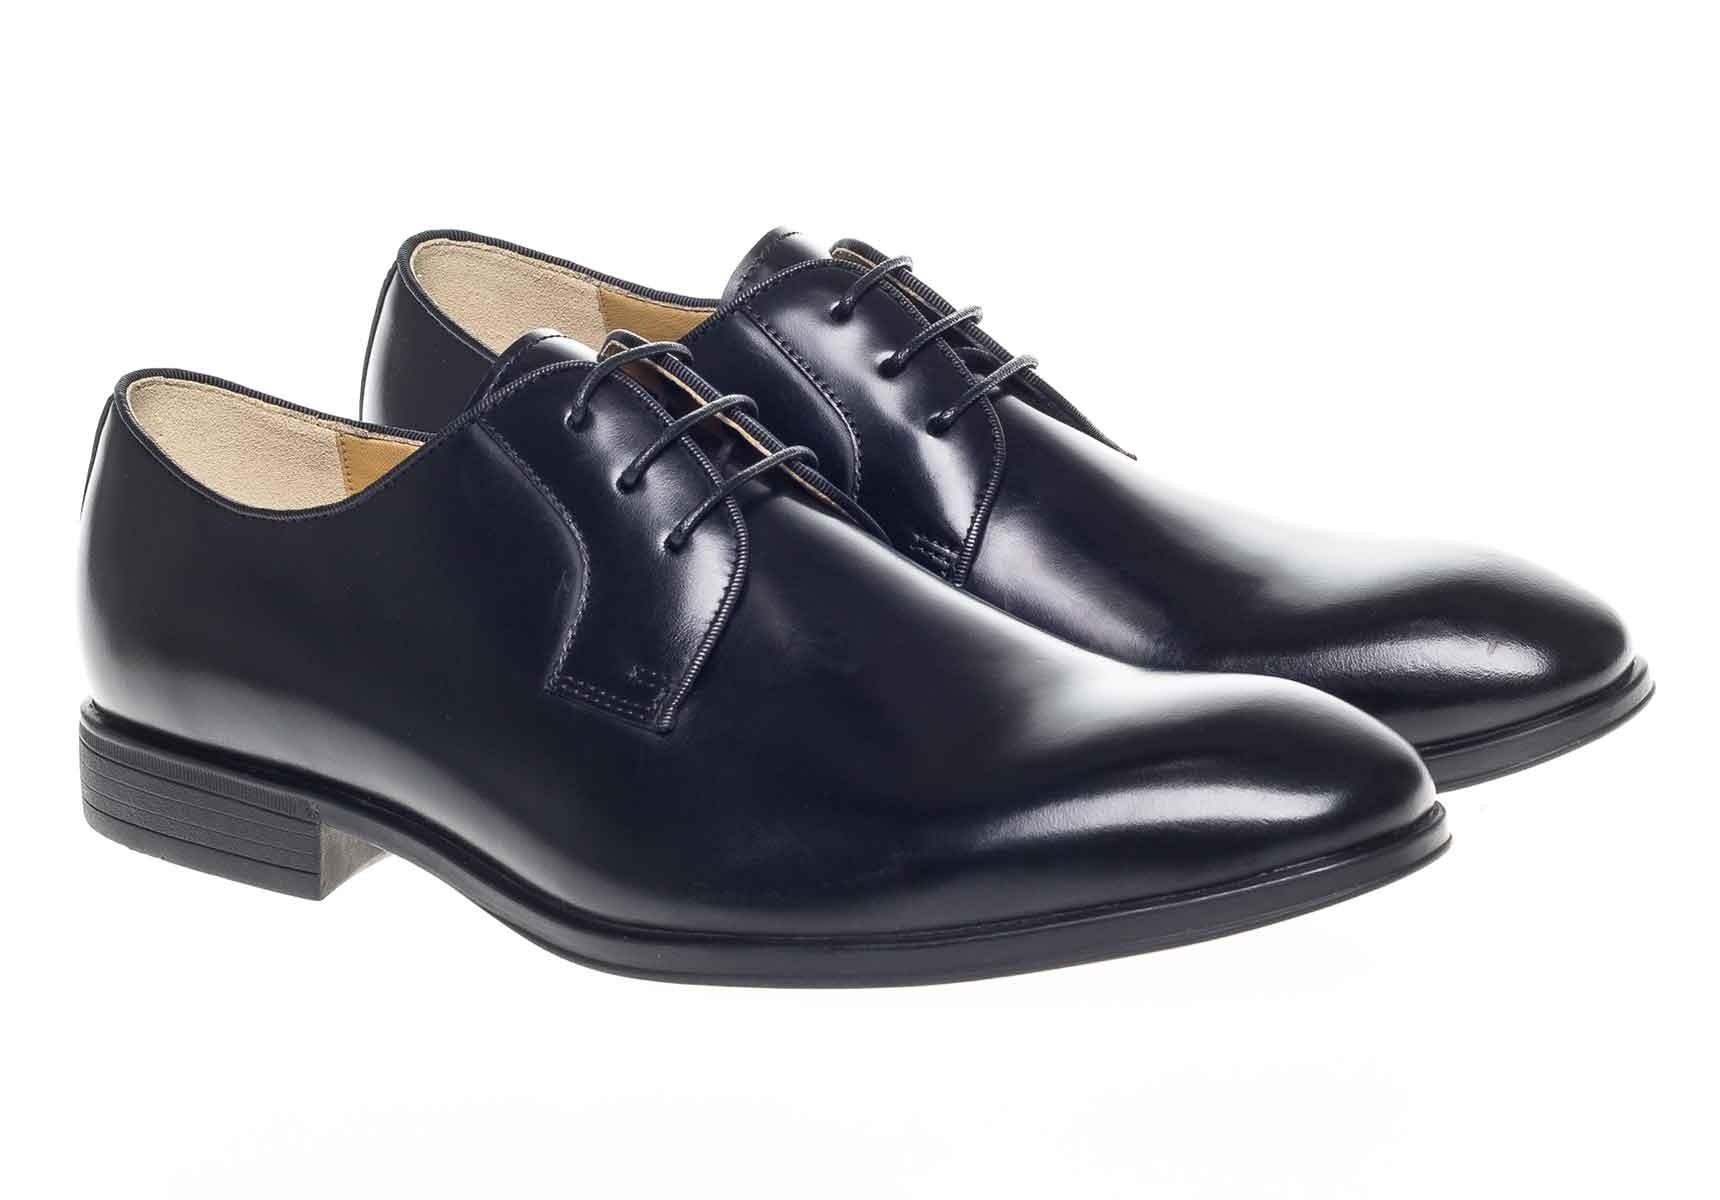 5edffa3051e0 Faro Robinson s for Shoemakers Men Steptronic Shoes HzxwnUTI